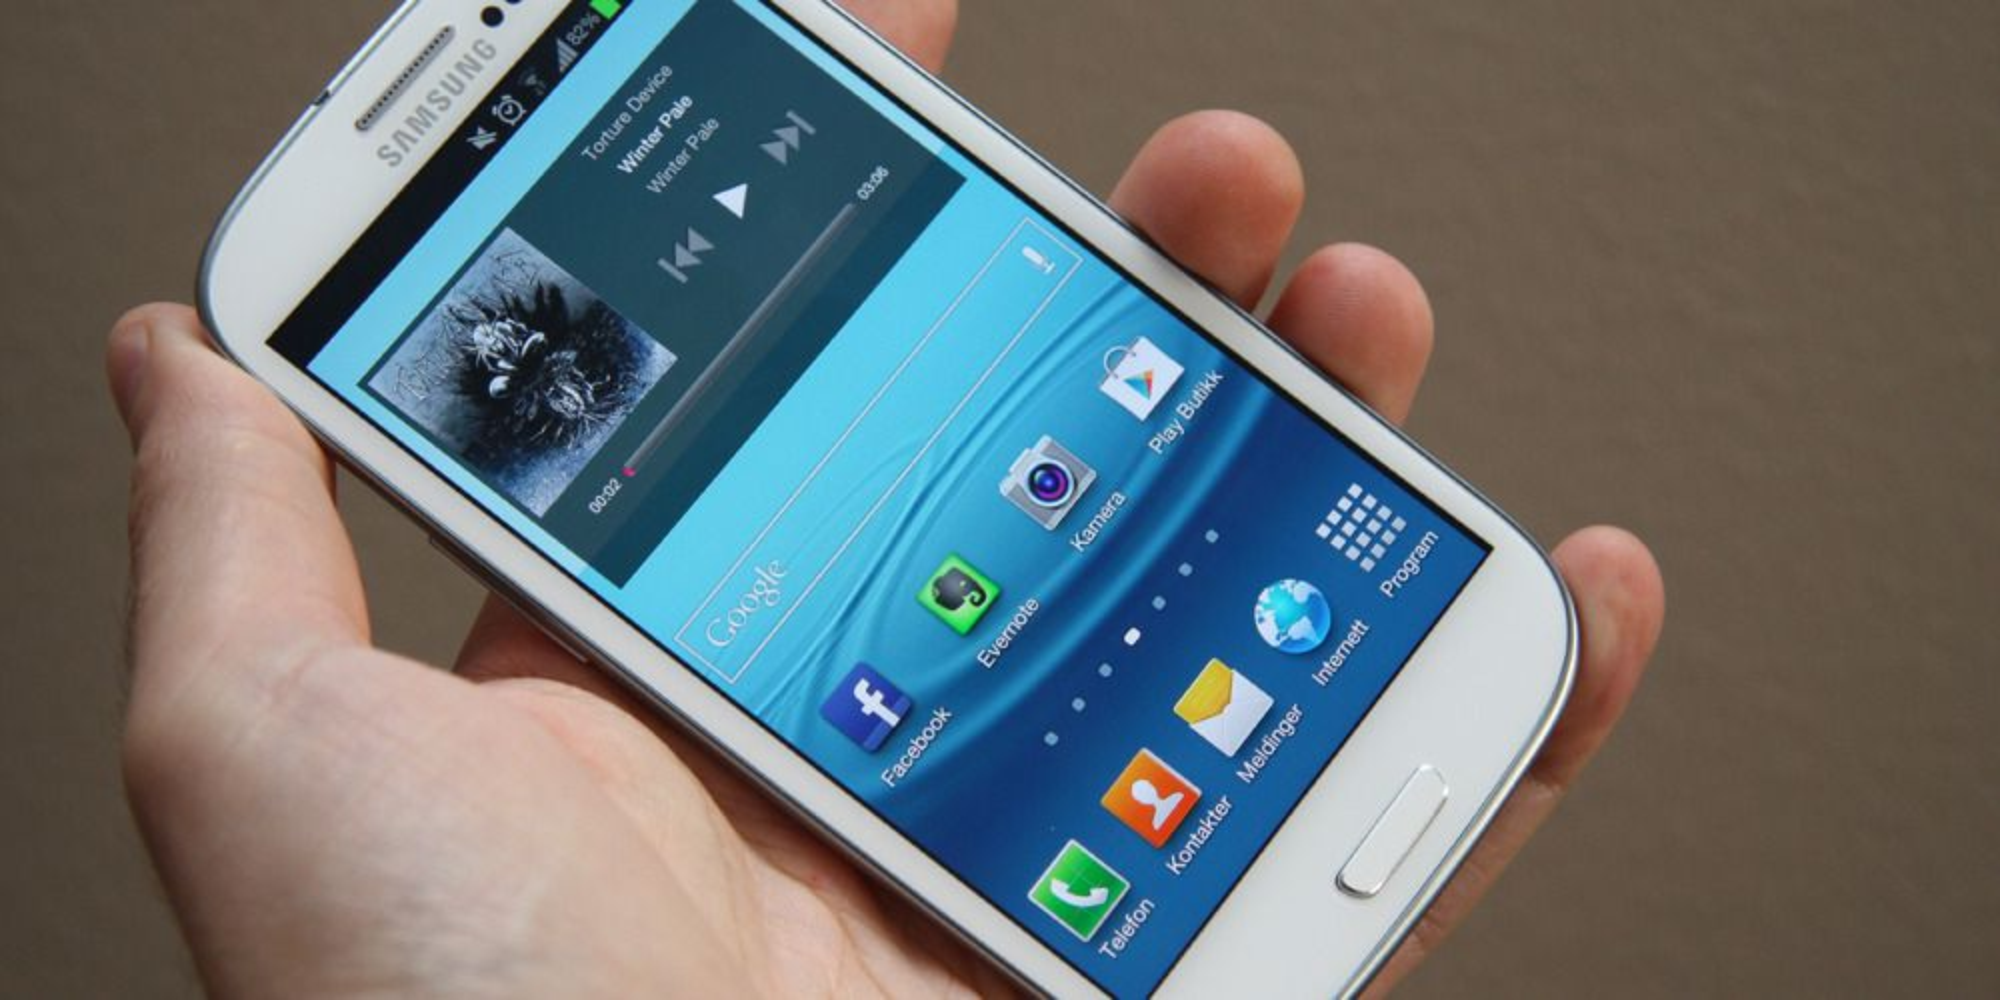 Dropper Galaxy S III med 64 GB